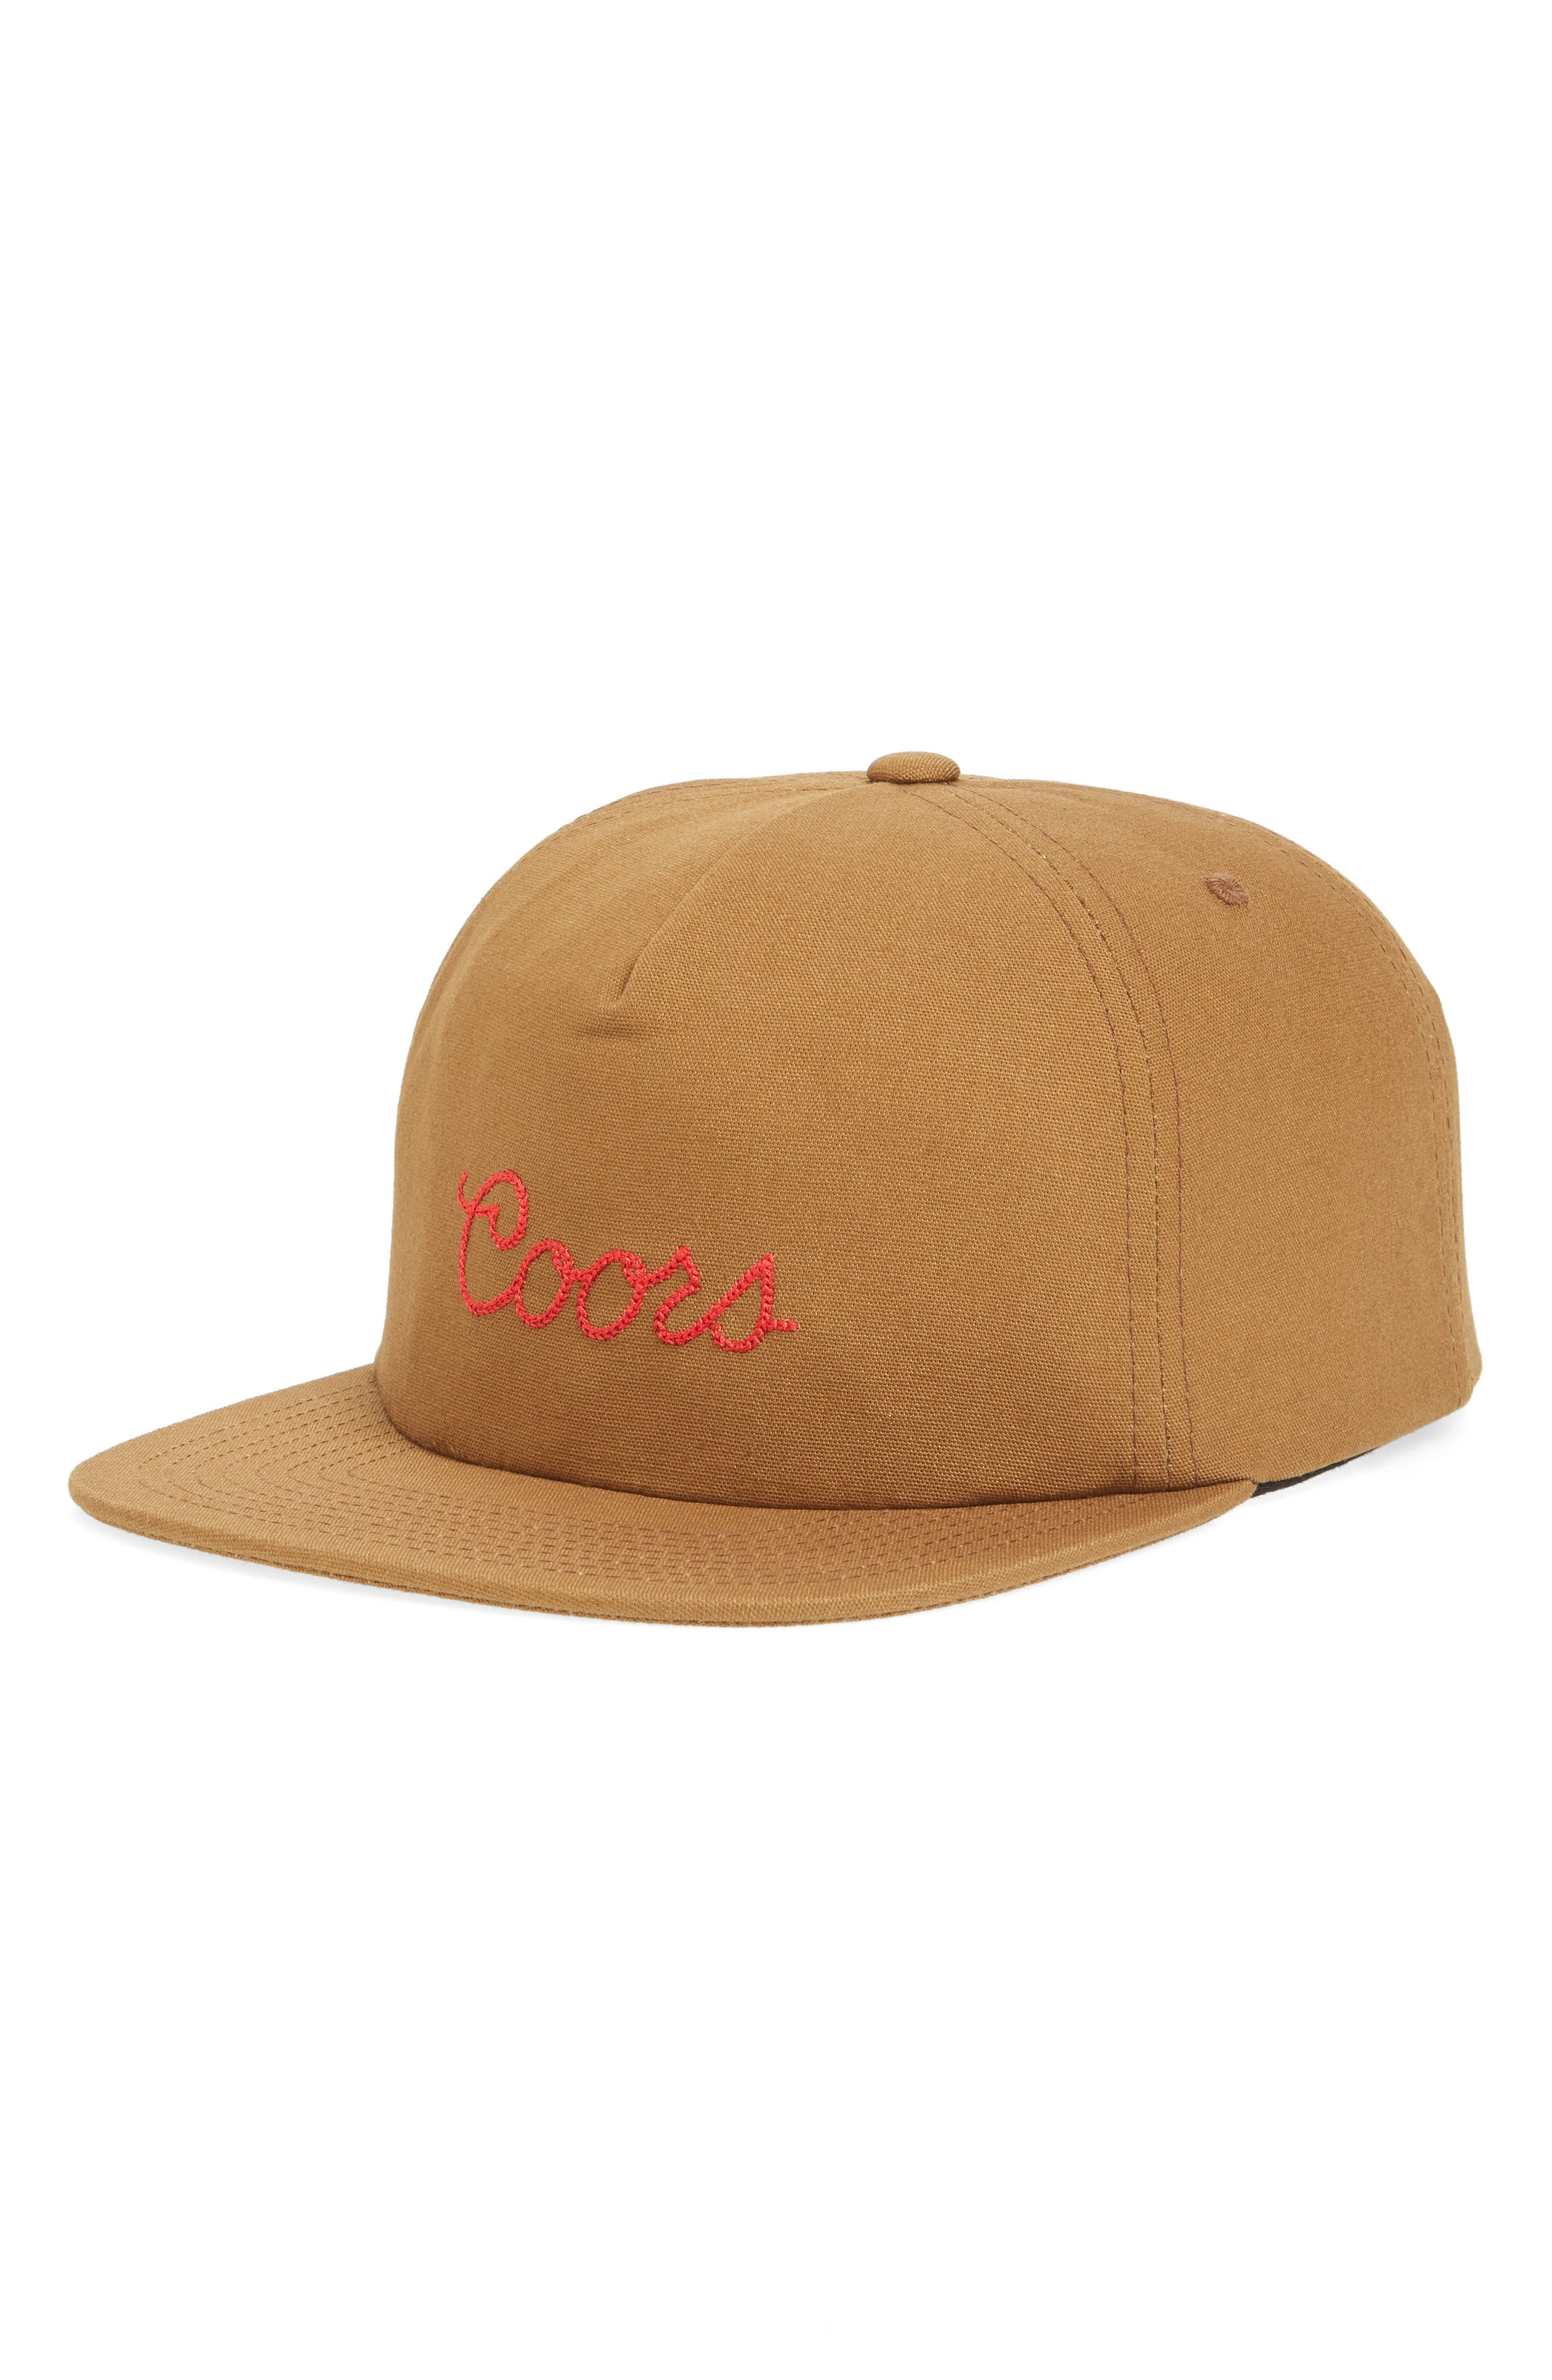 BRIXTON,                             Coors Roping Logo Cap,                             Main thumbnail 1, color,                             200